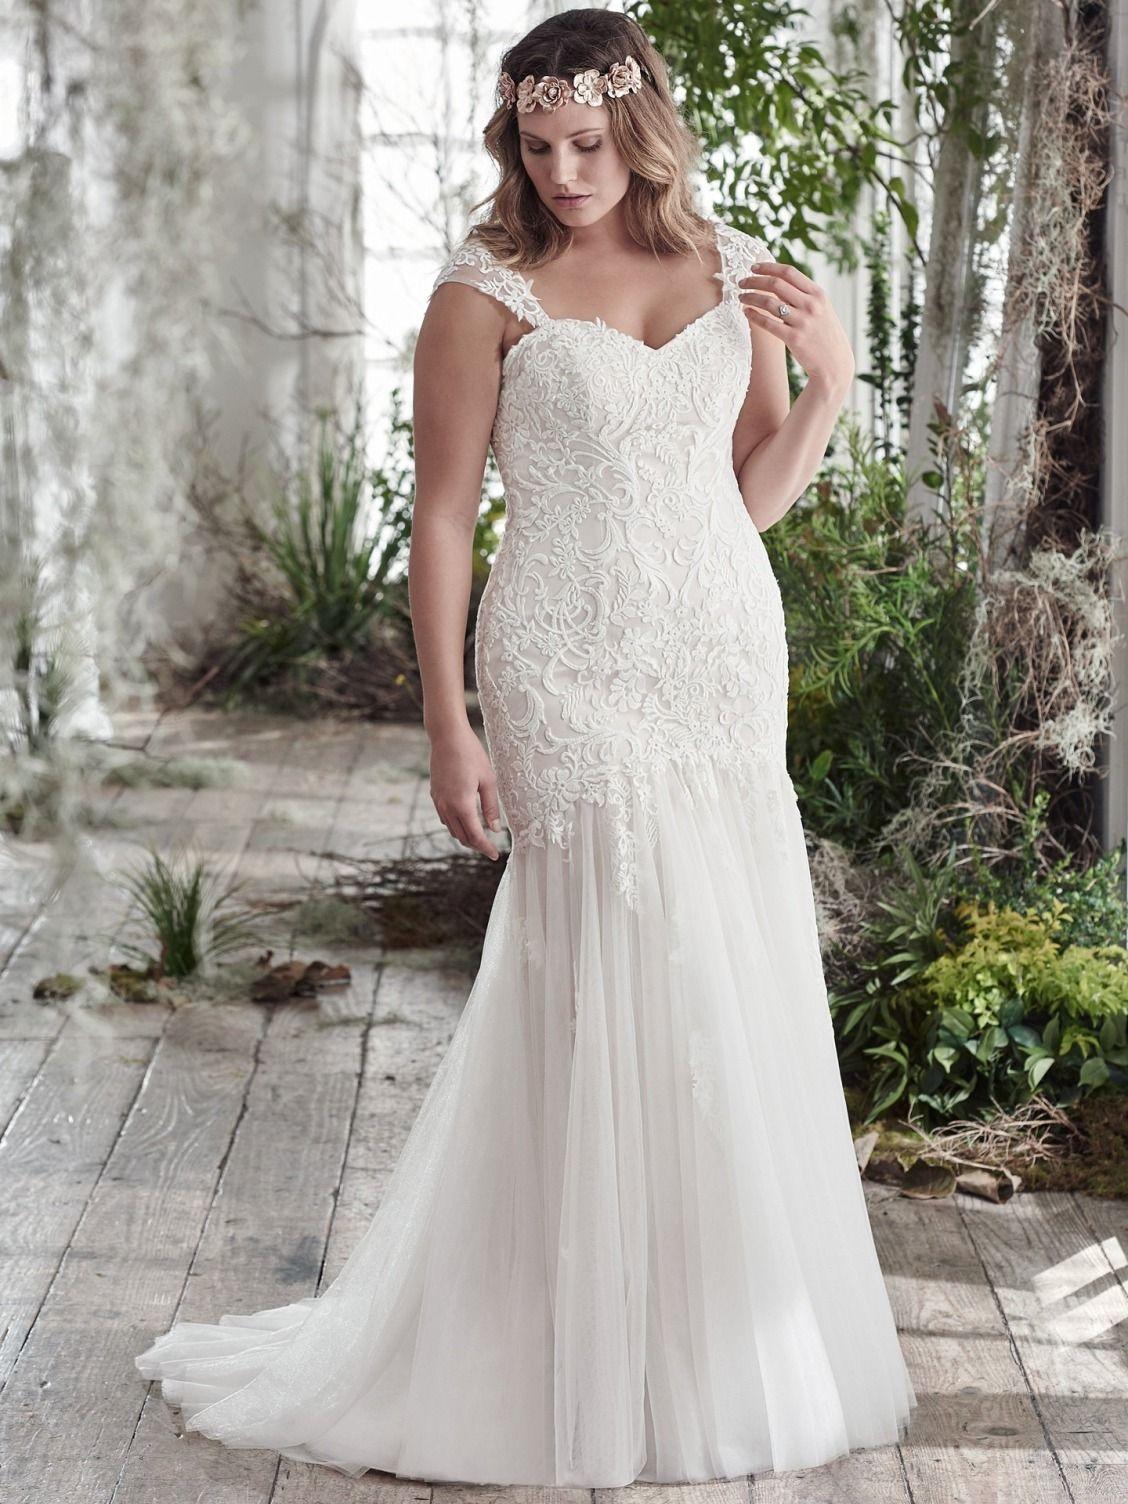 AZURA by Maggie Sottero Wedding Dresses | Plus Size Wedding ...